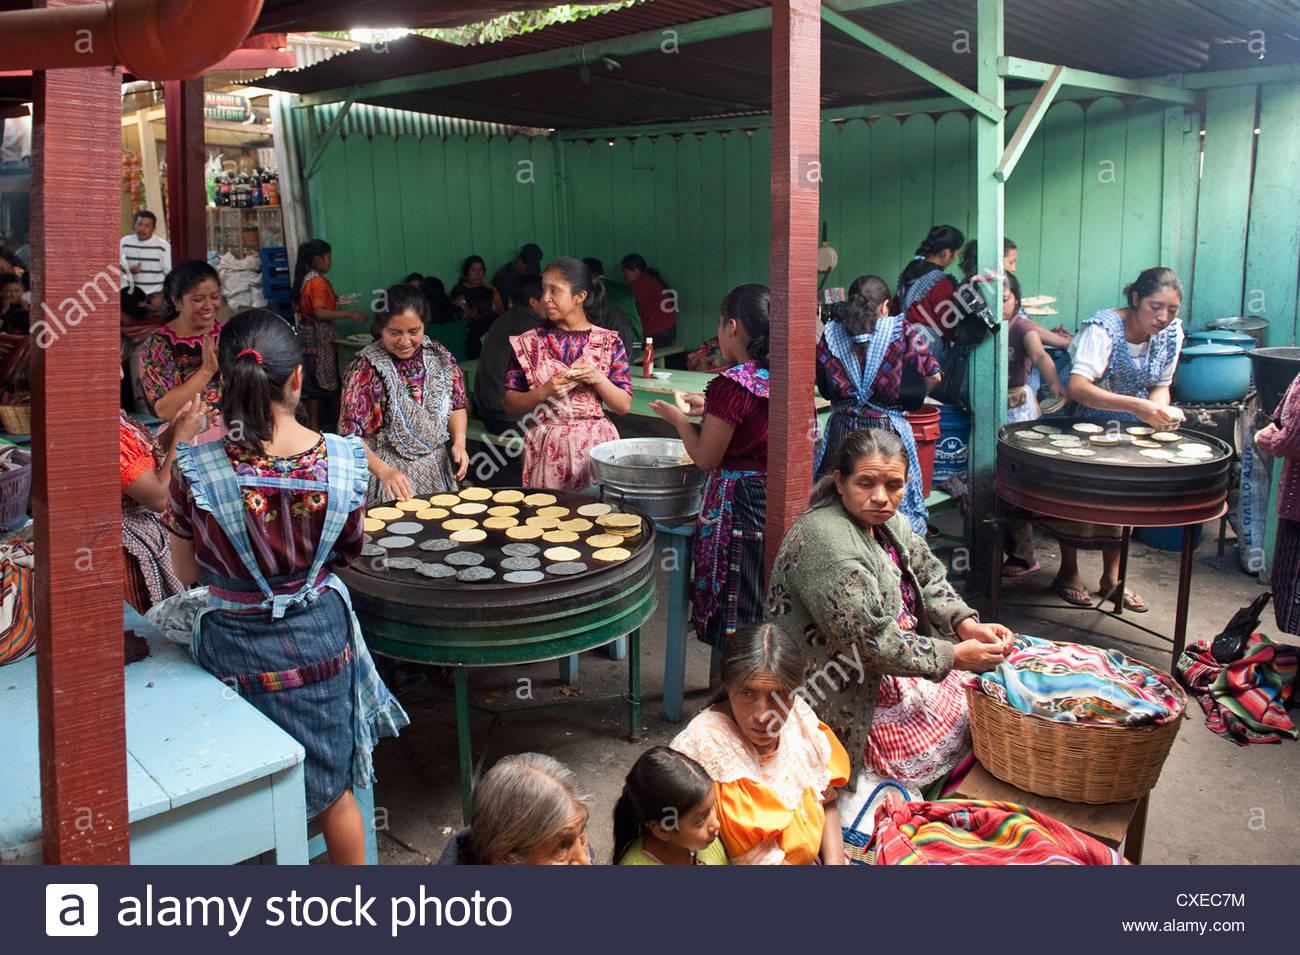 Mittagessen, Vorbereitung, Chichicastenango Markt, Chichicastenango, Guatemala, Mittelamerika Stockbild